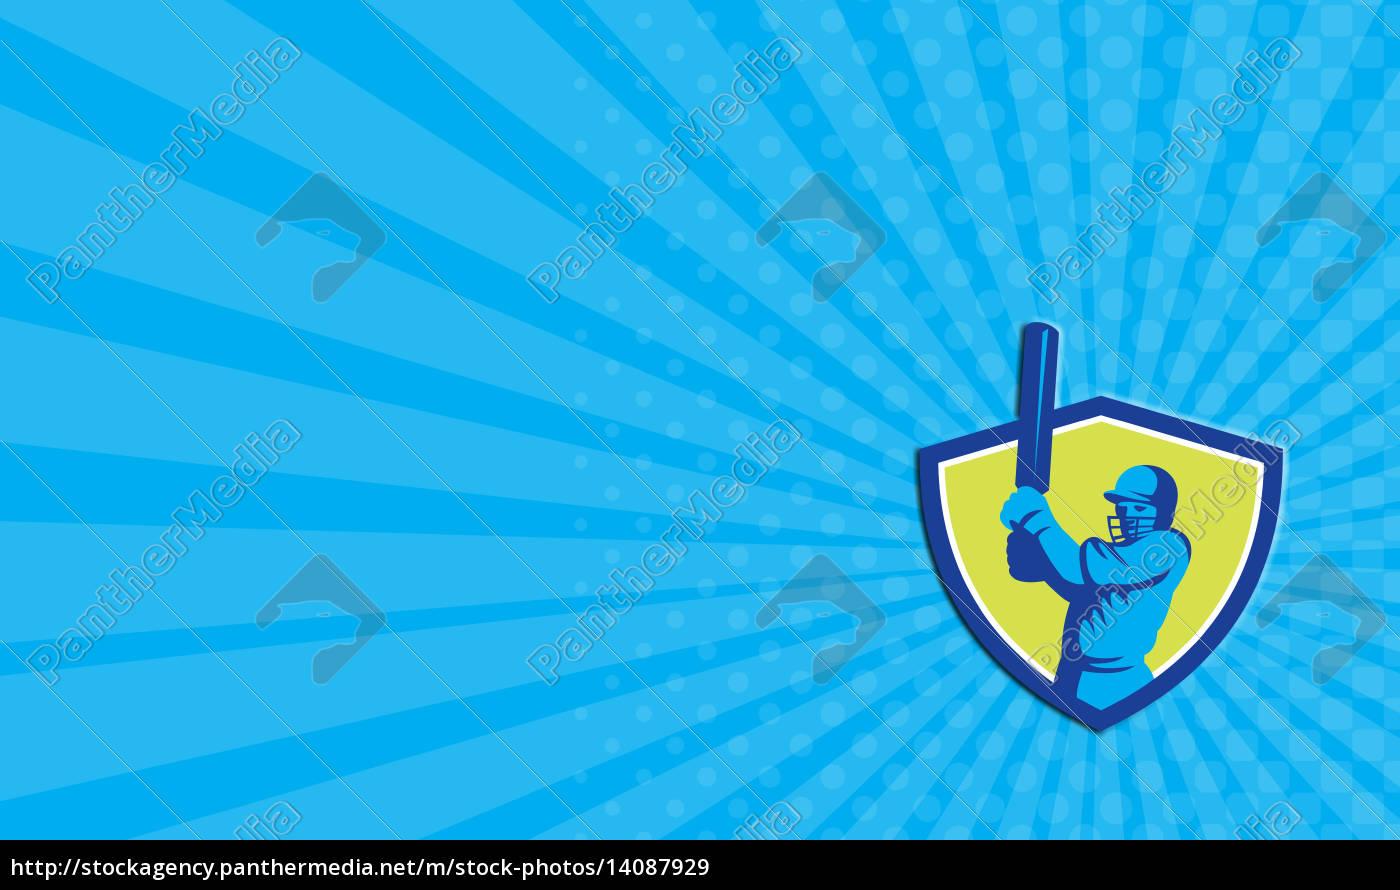 business, card, cricket, player, batsman, batting - 14087929